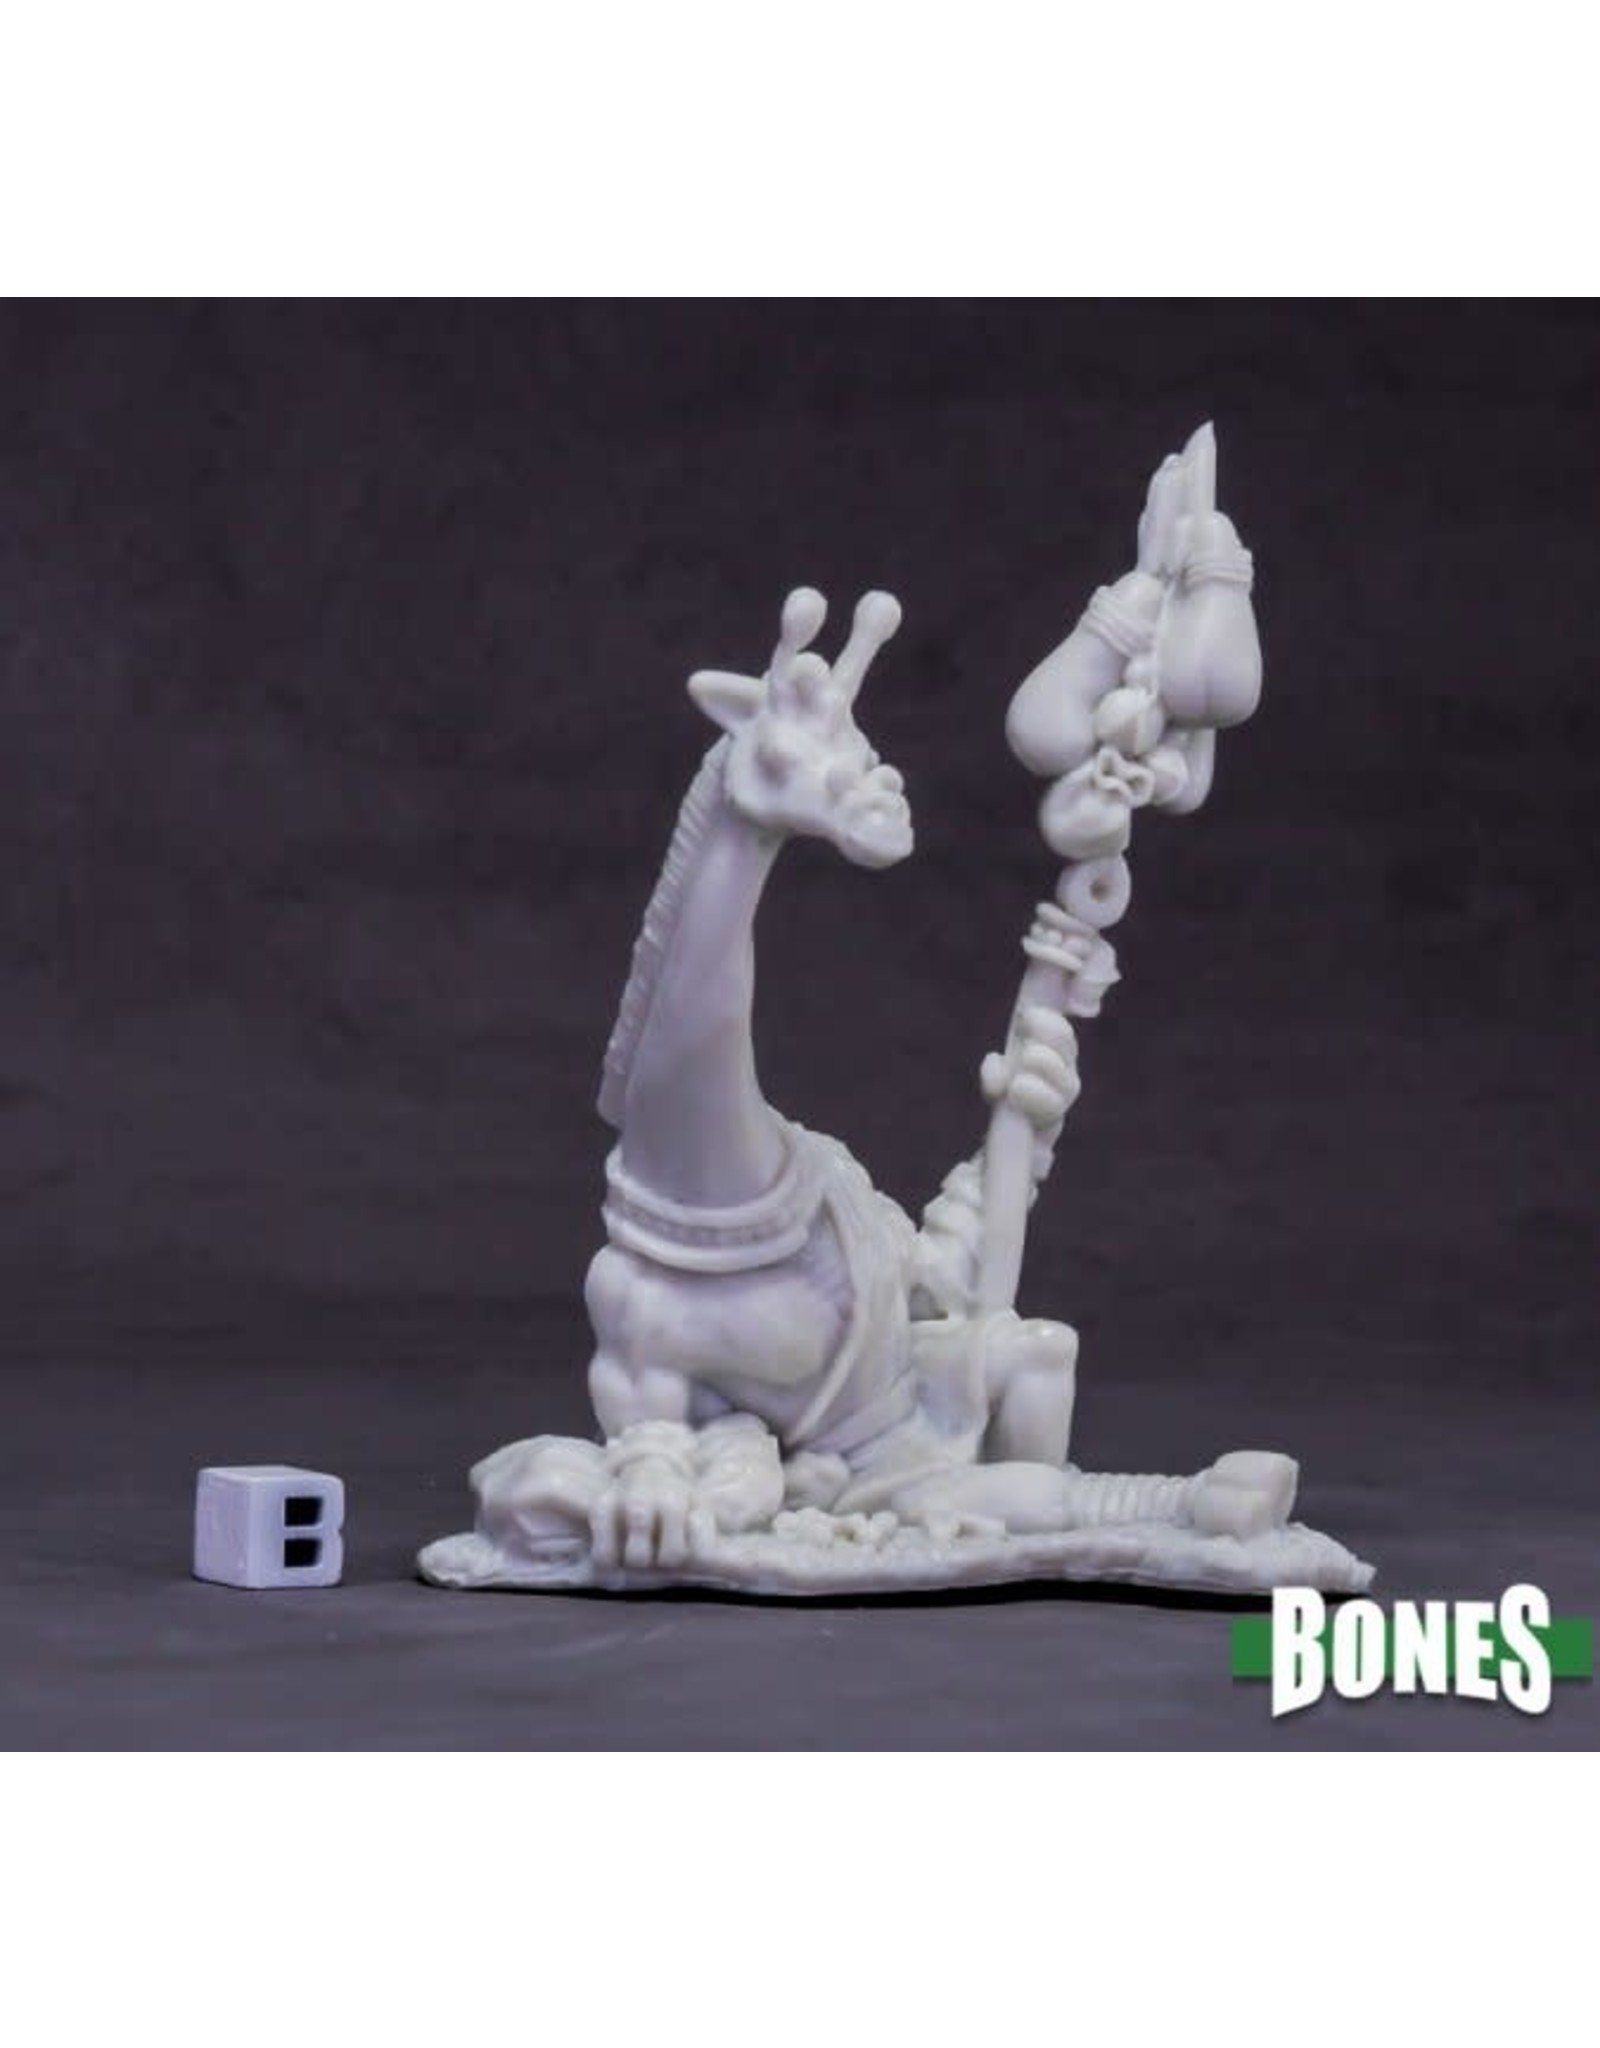 Reaper Miniatures Bones Avatar of Wisdom (Giraffe)